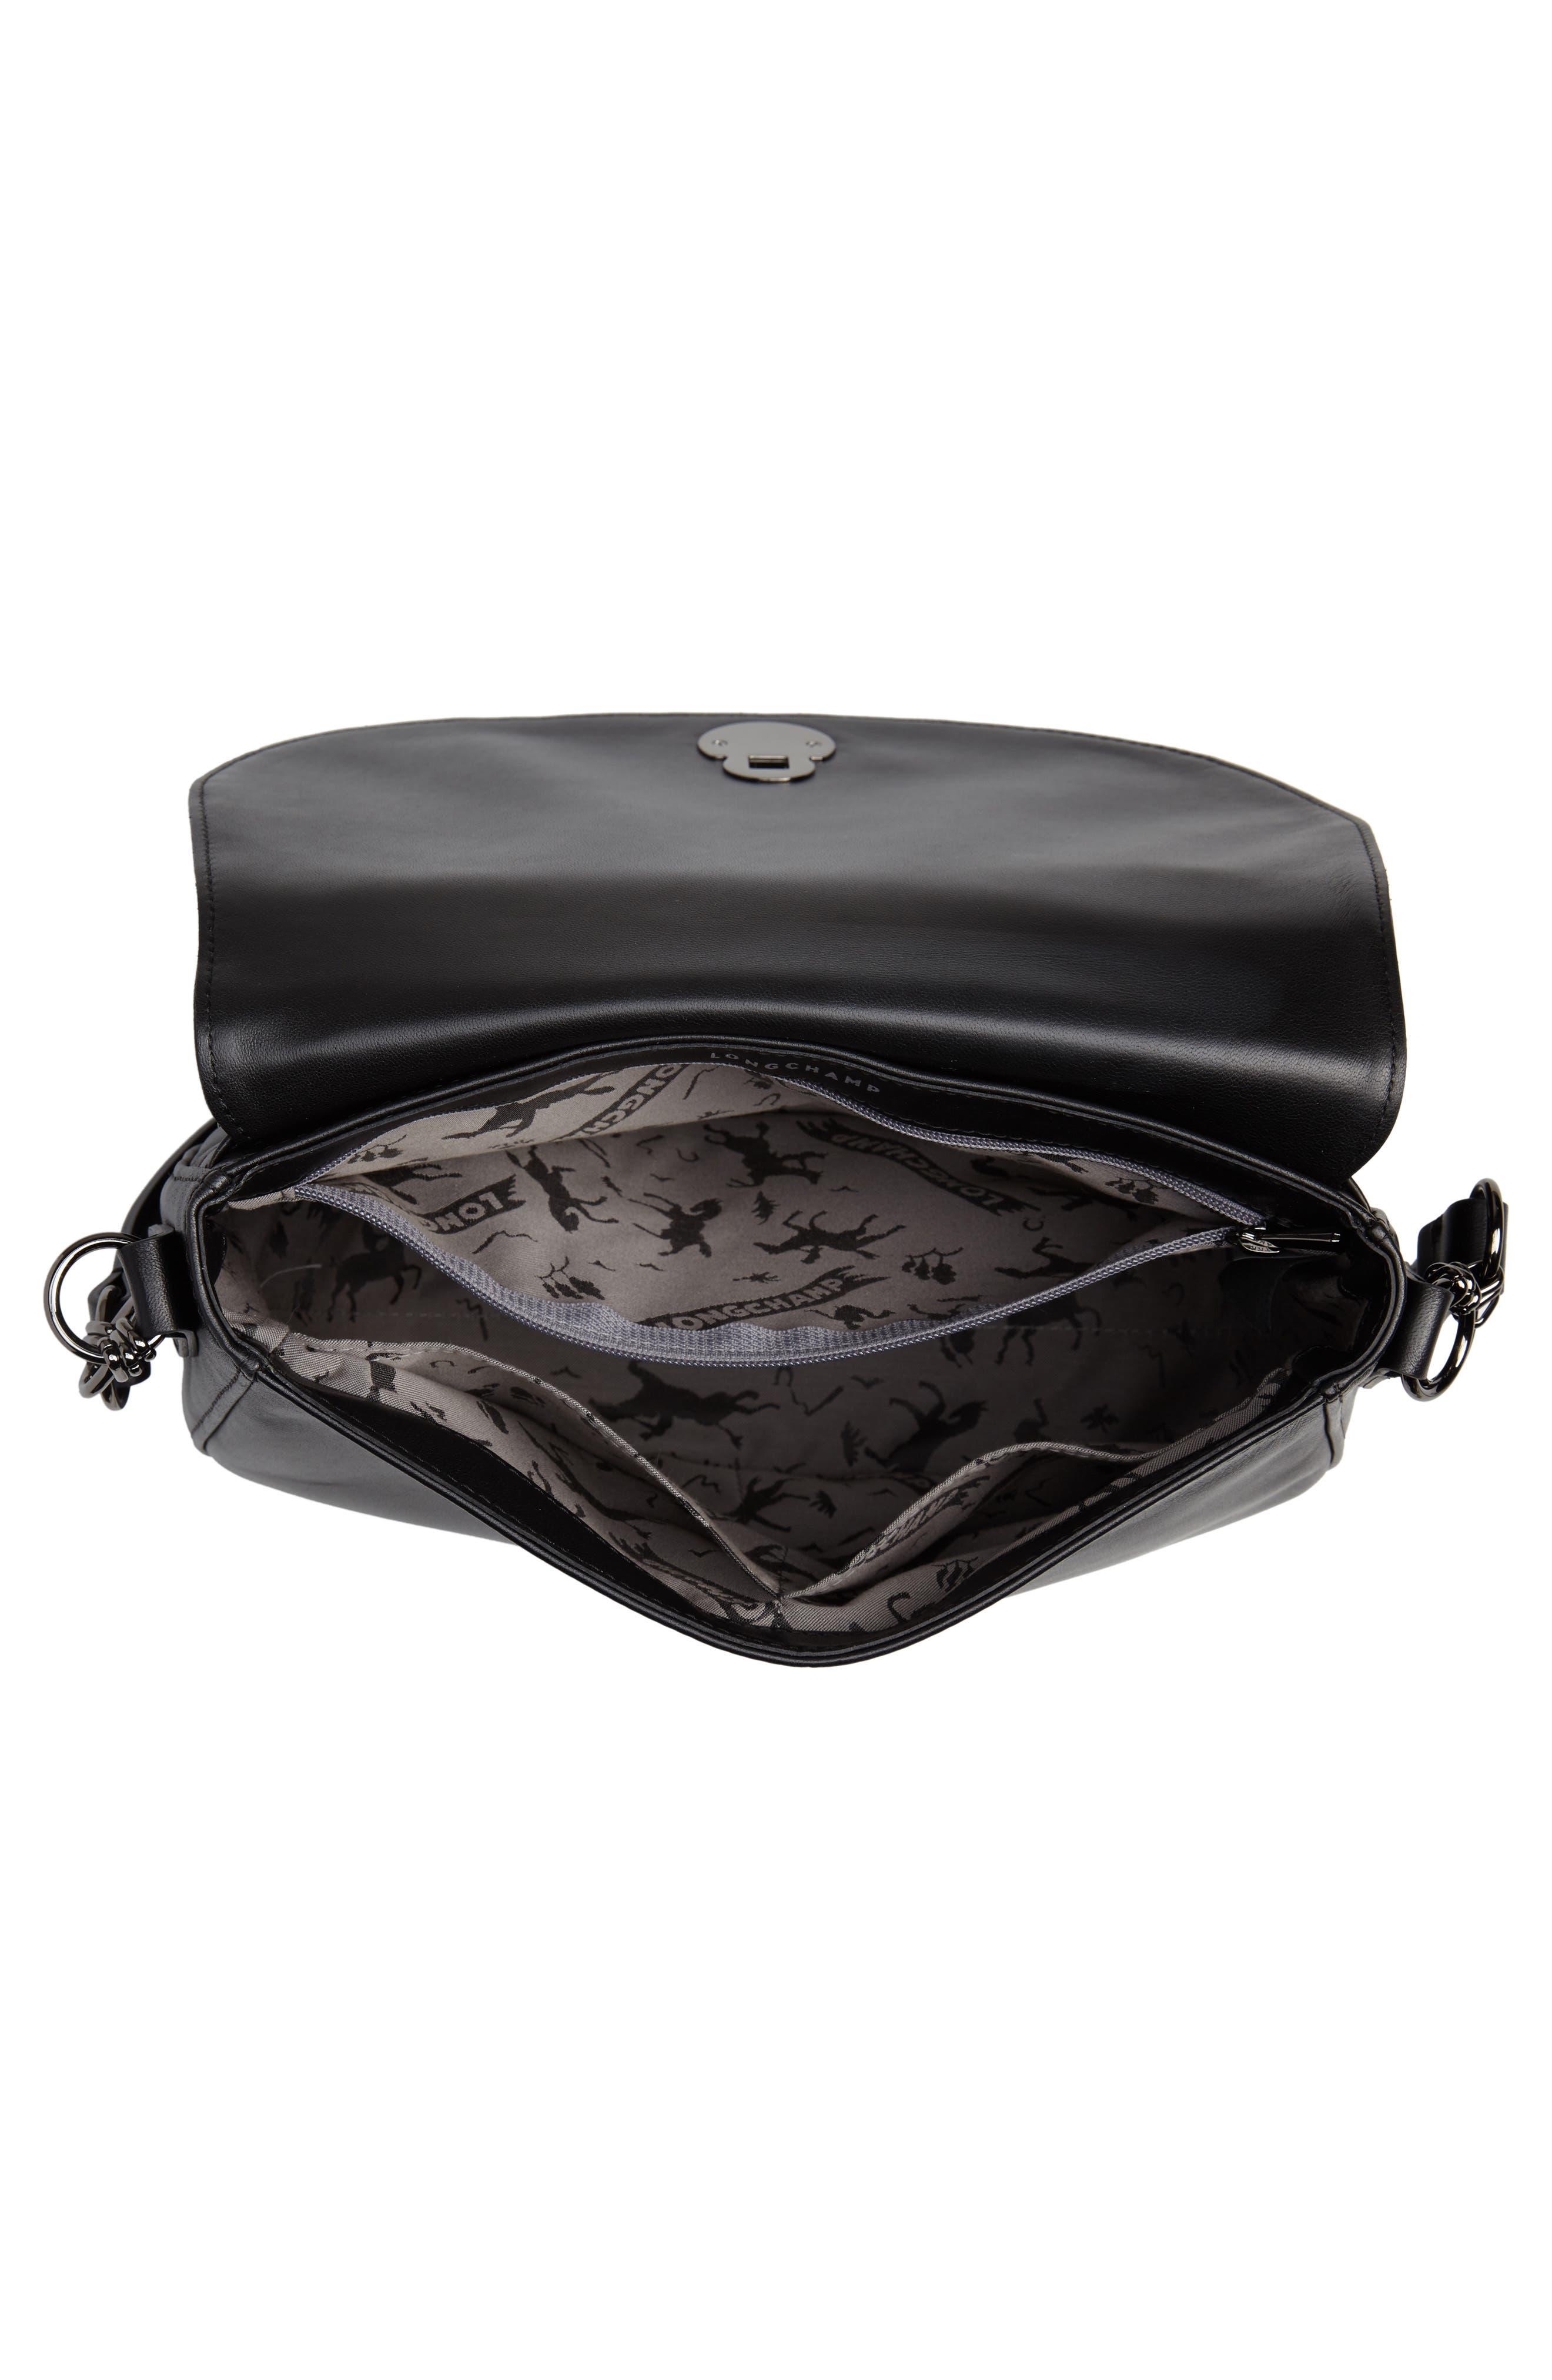 Medium Cavalcade Leather Saddle Bag,                             Alternate thumbnail 4, color,                             BLACK